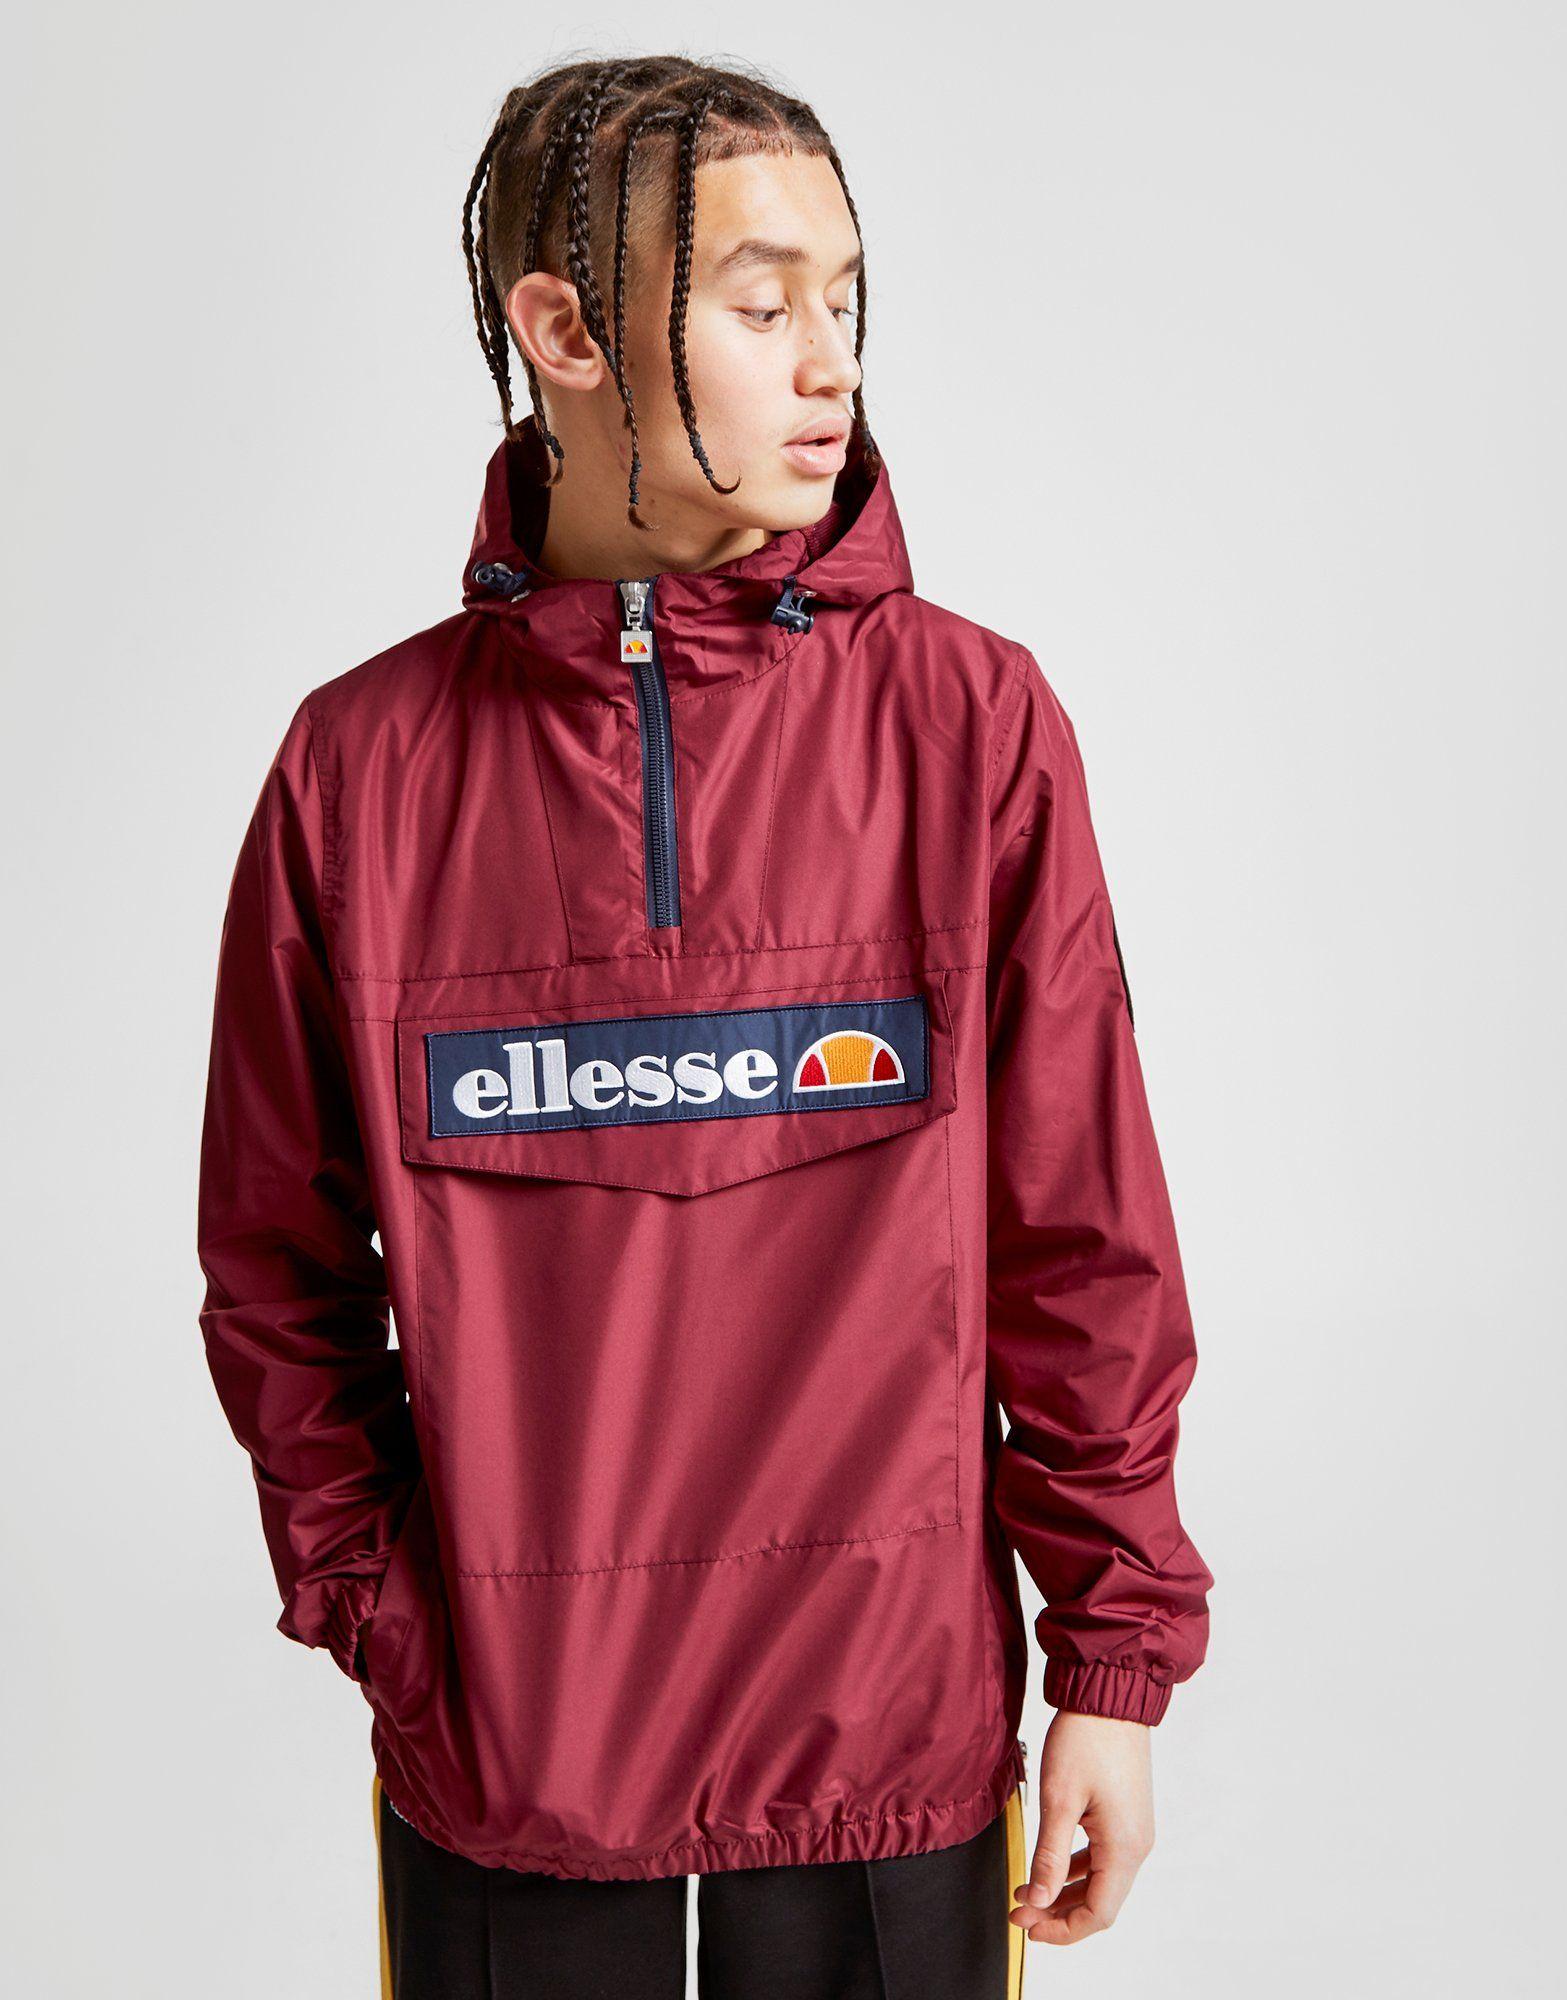 Ellesse Monaria Jacket